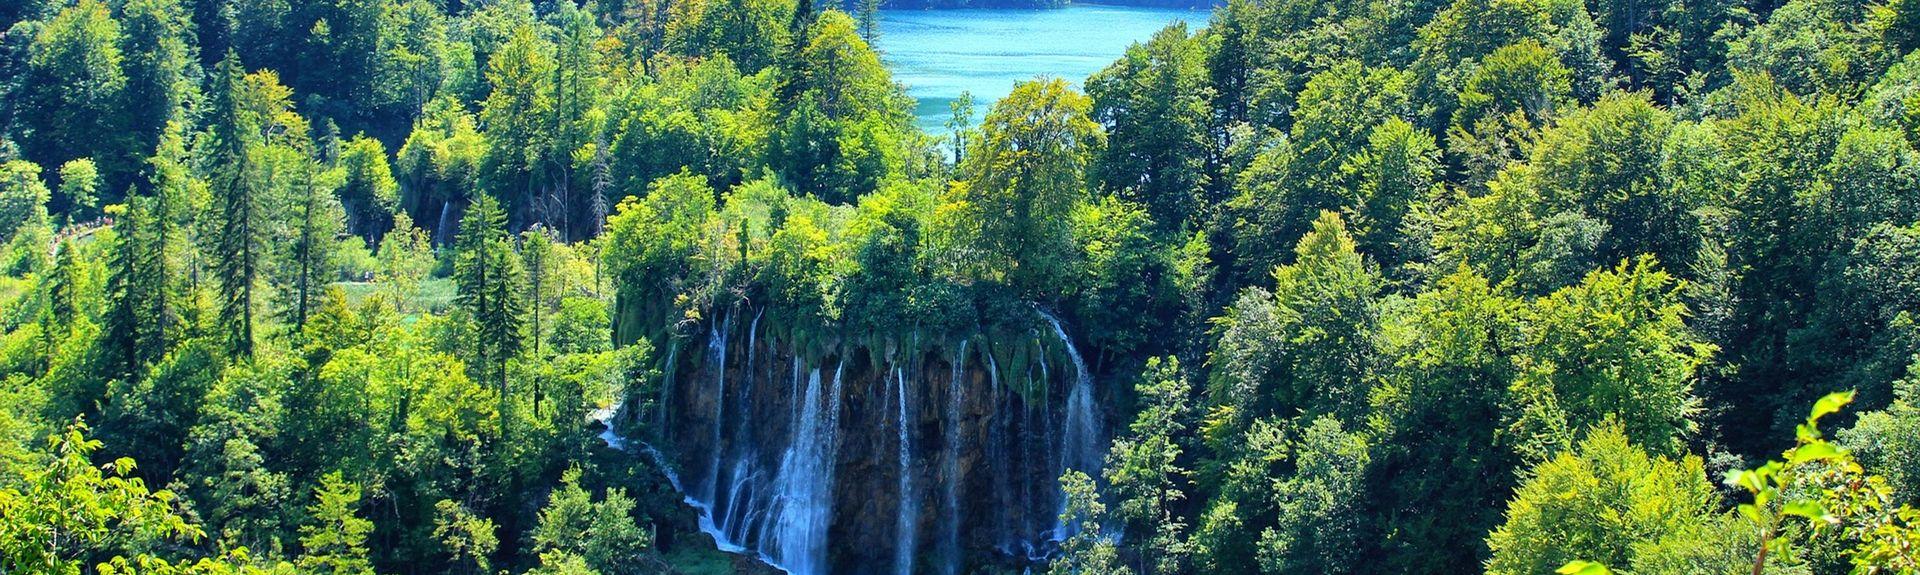 Karlovac County, Croatia